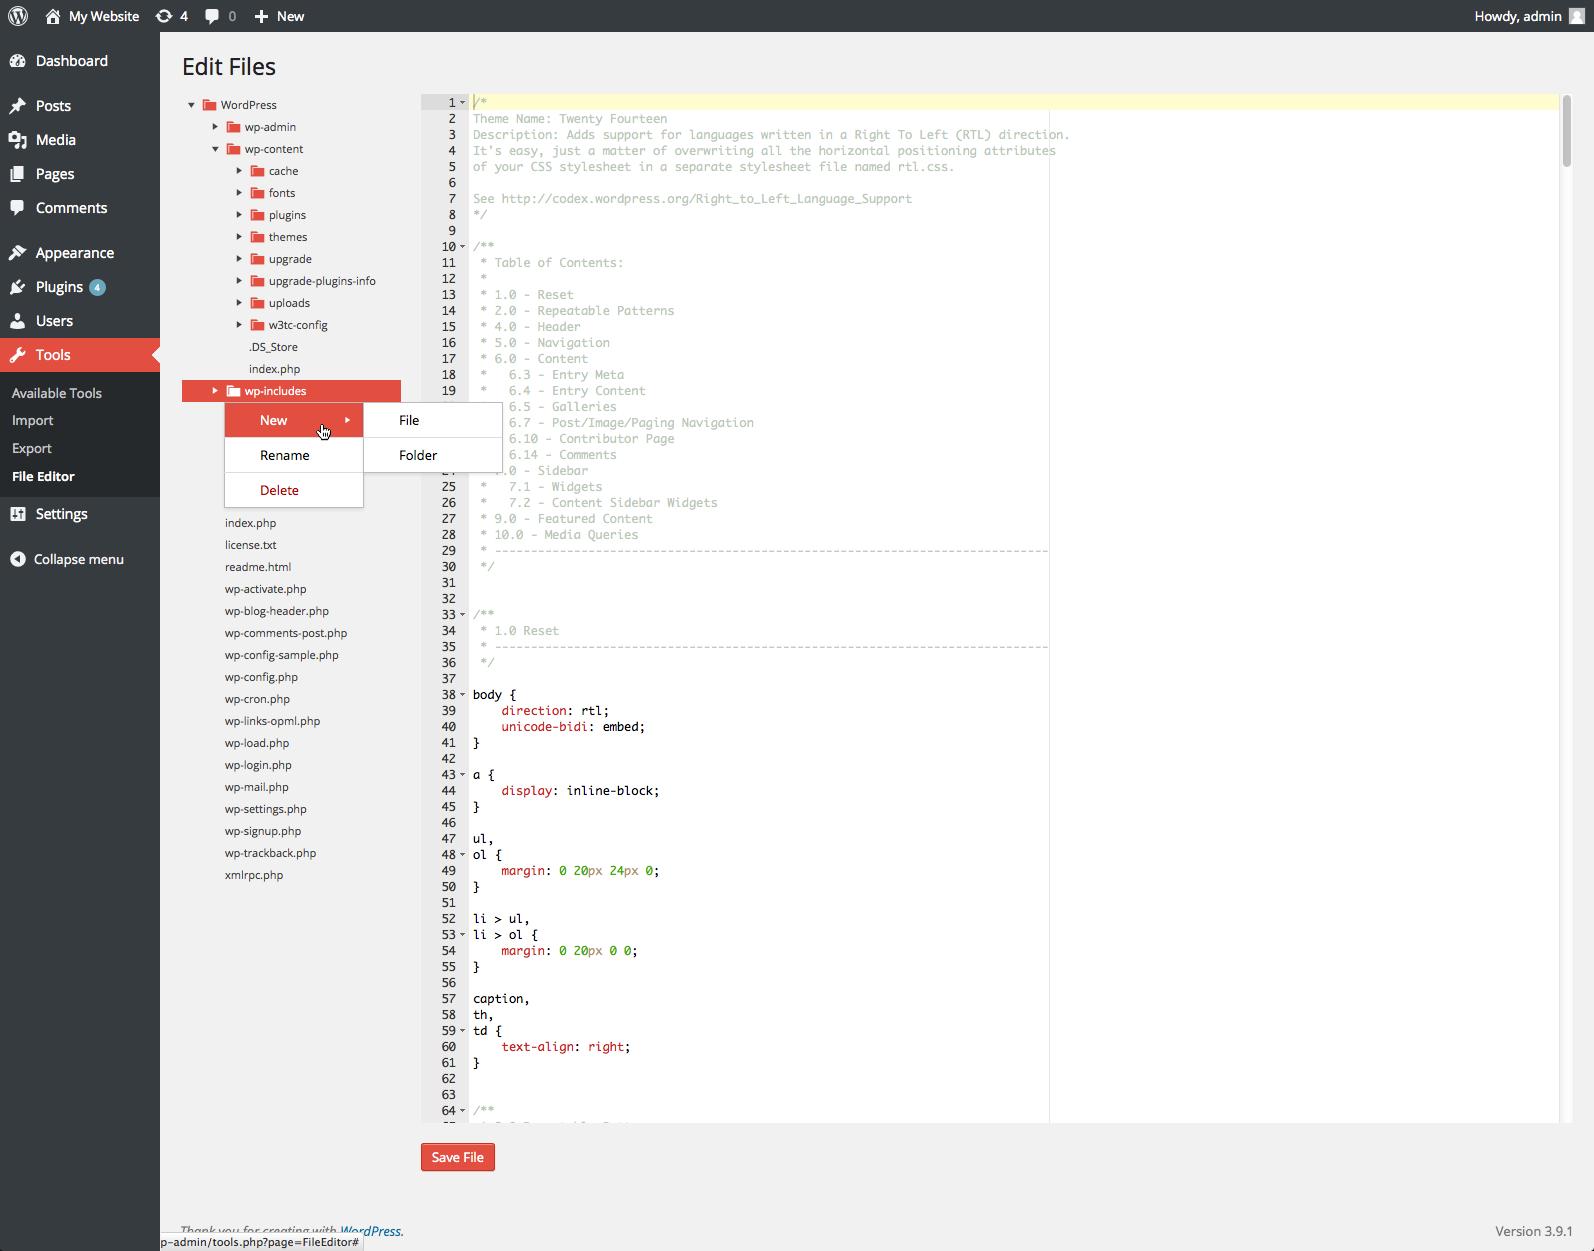 Fresh-File-Editor-v1.0.0543